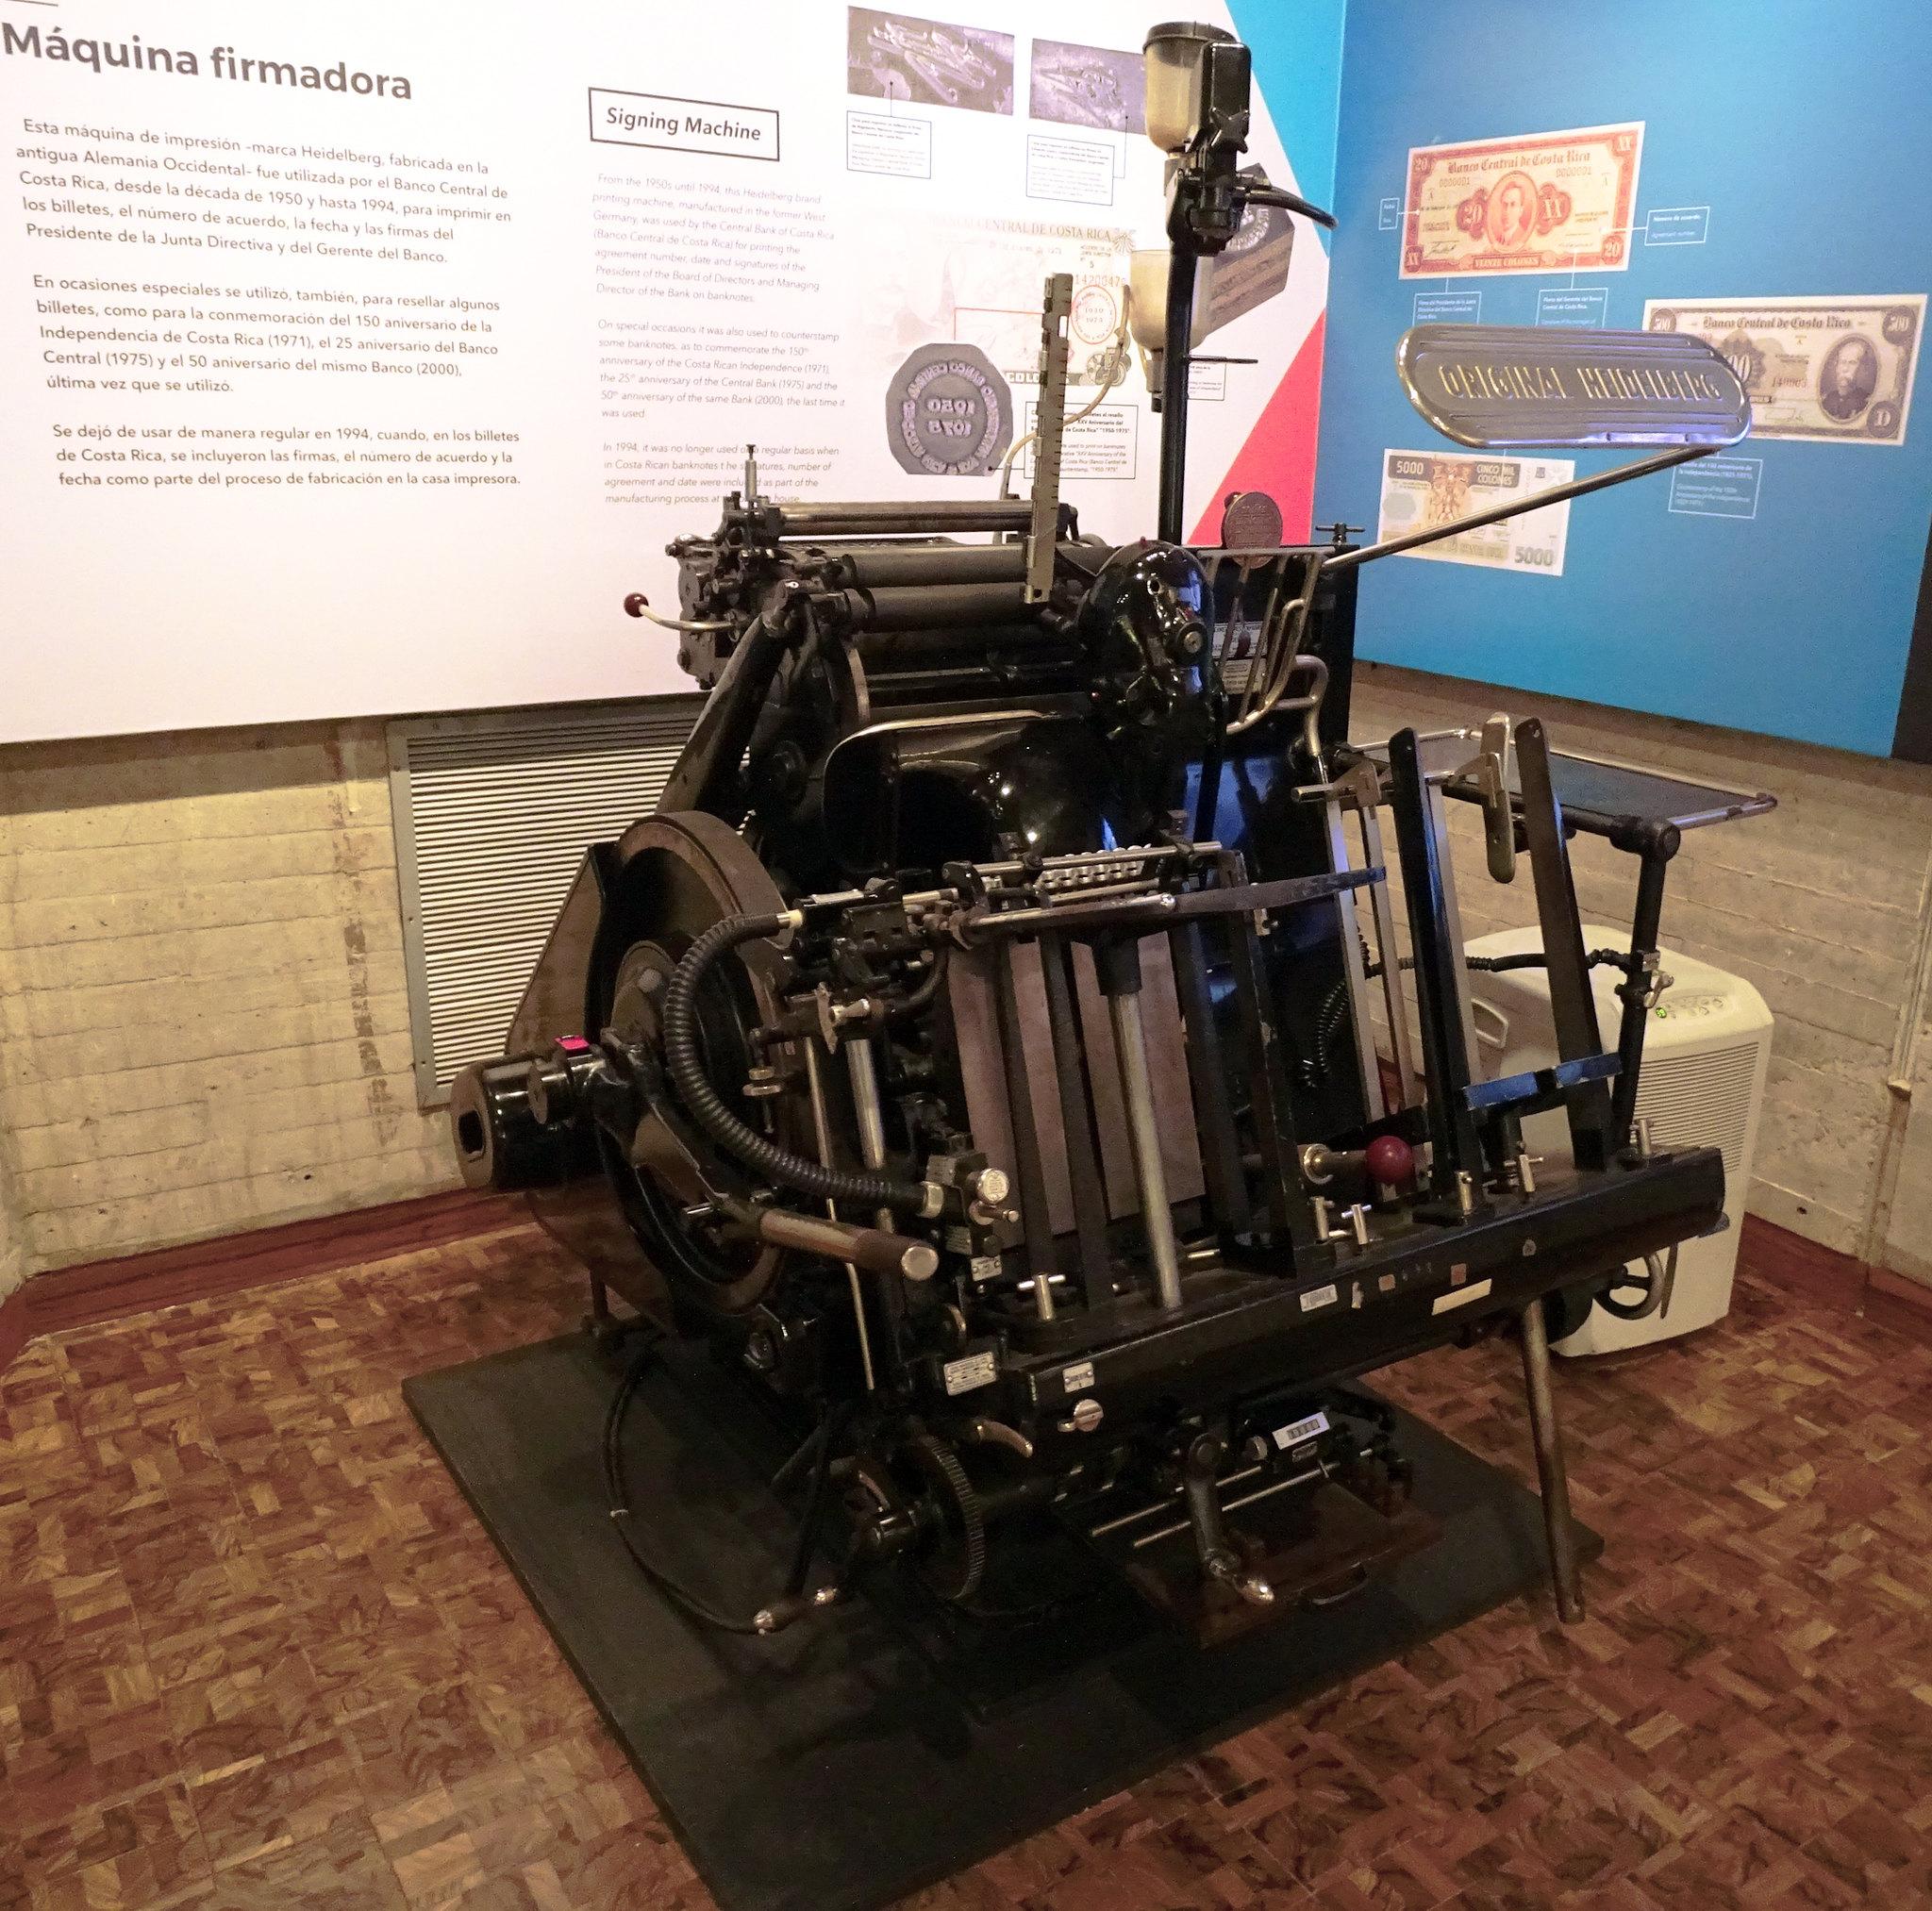 Maquina firmadora Museo de Numismatica Banco Central San Jose Costa Rica